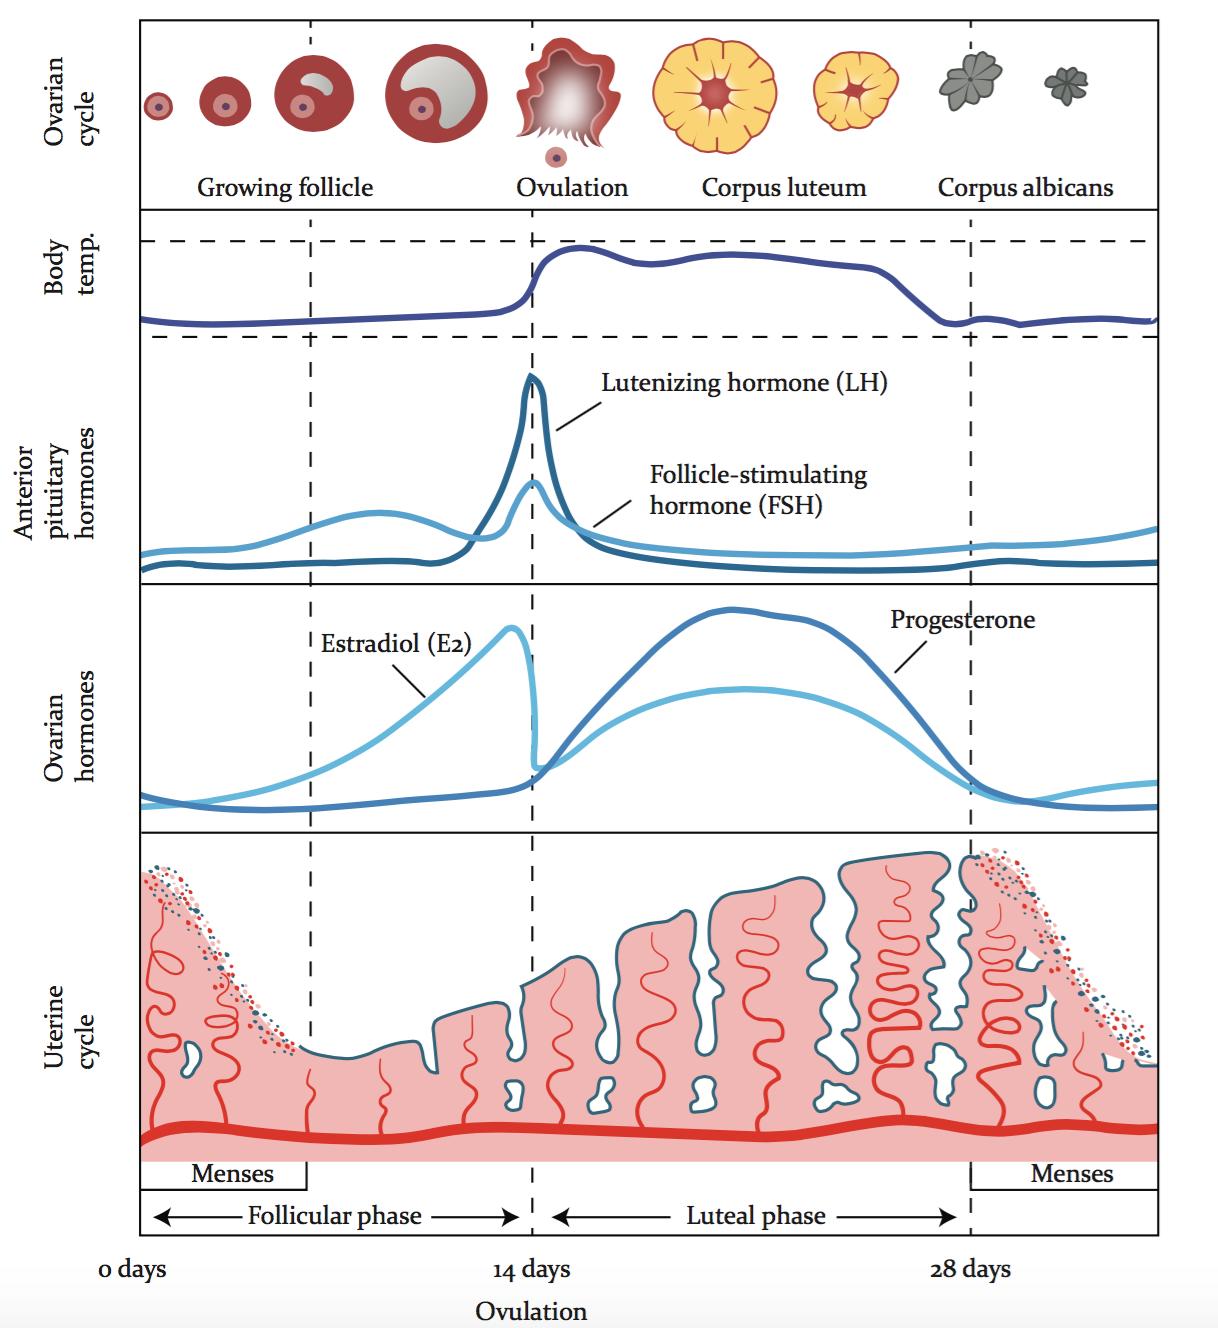 Summary of Menstrual Cycle